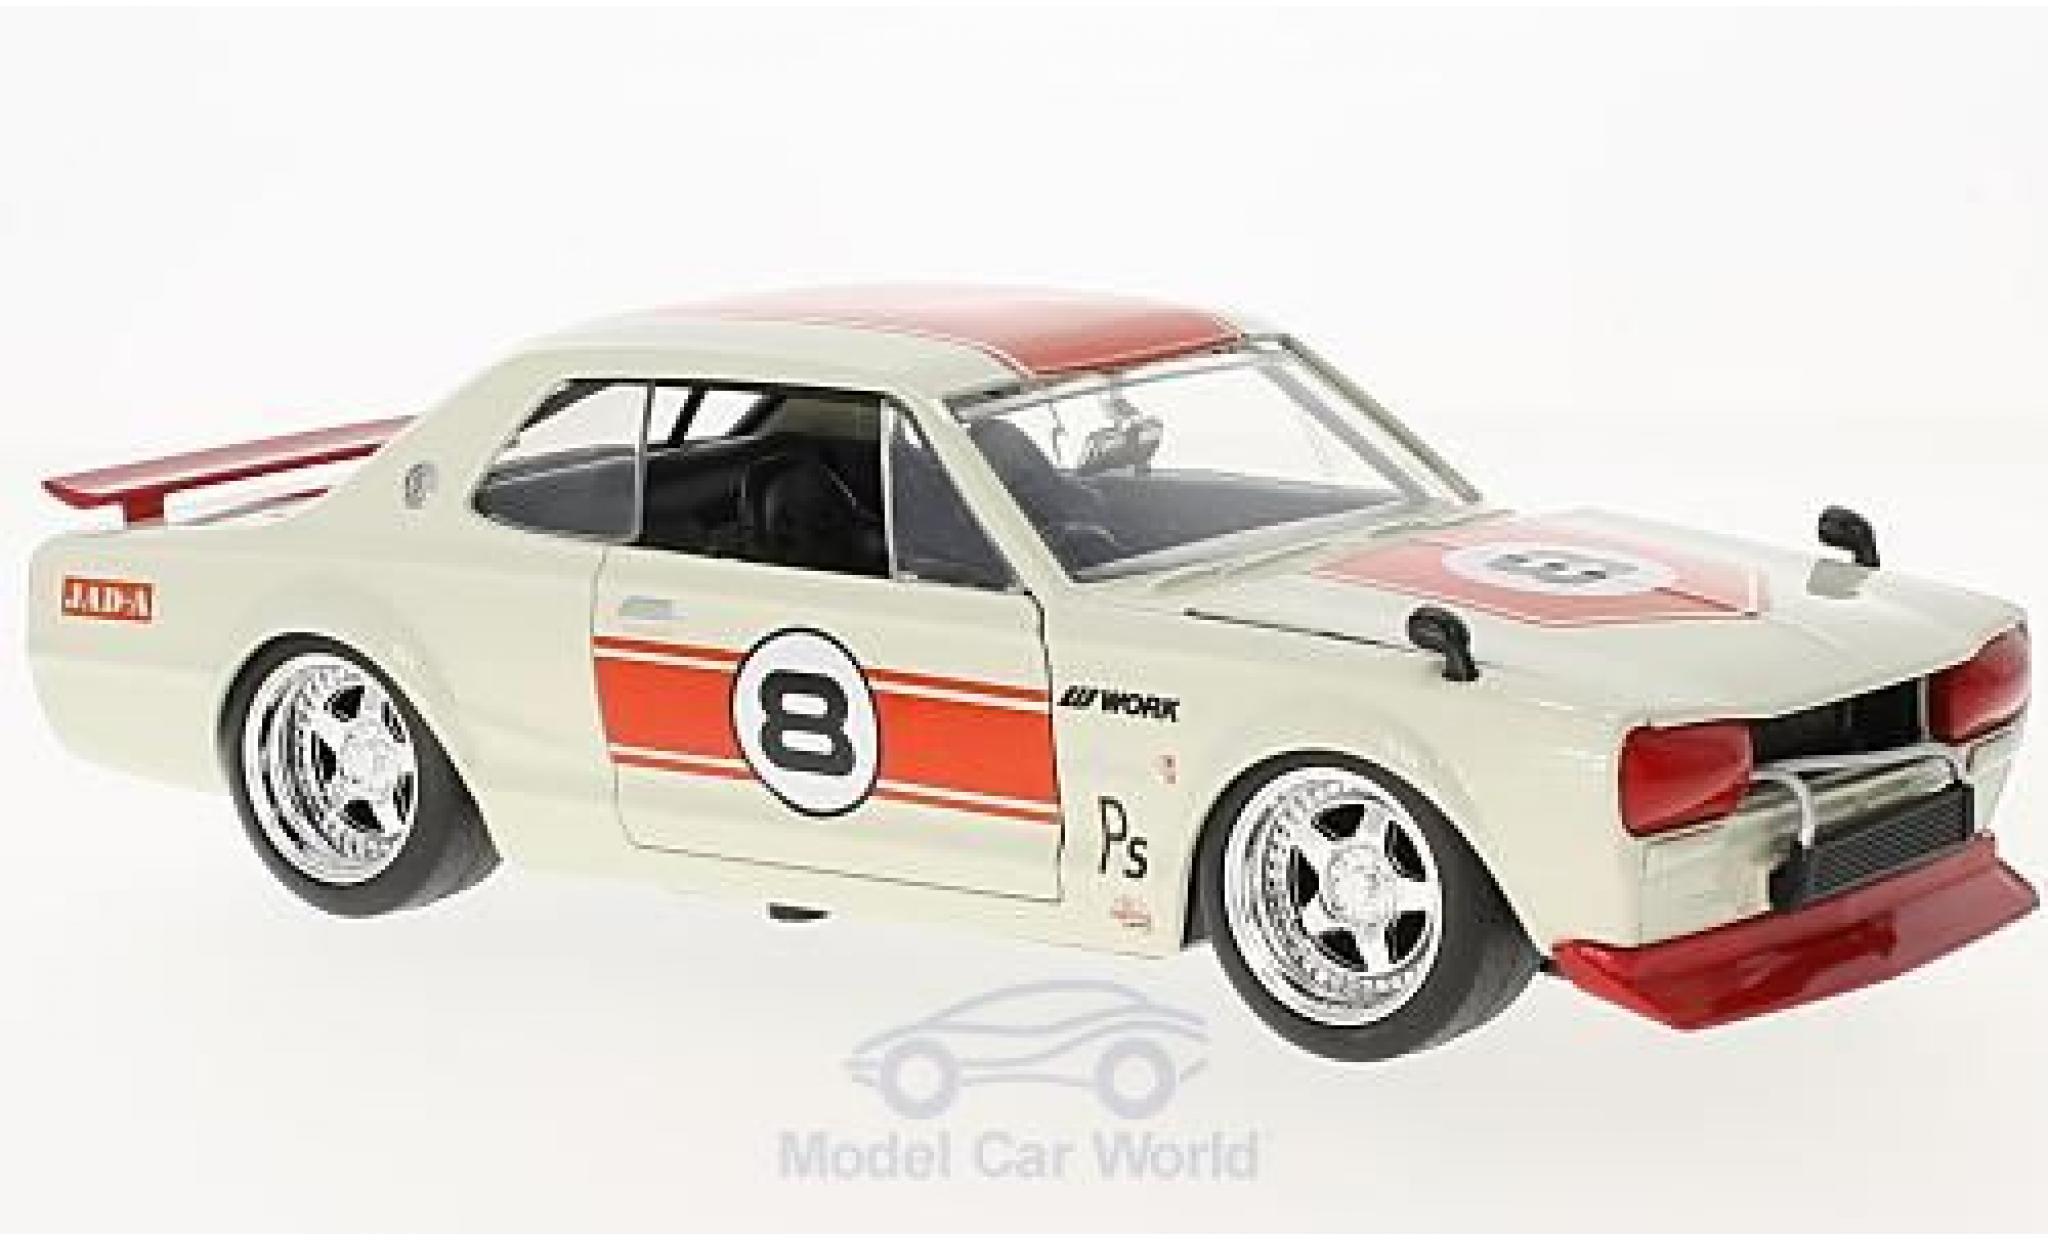 Nissan Skyline 1/24 Jada 2000 GT-R (KPGC 10) bianco/rosso RHD 1971